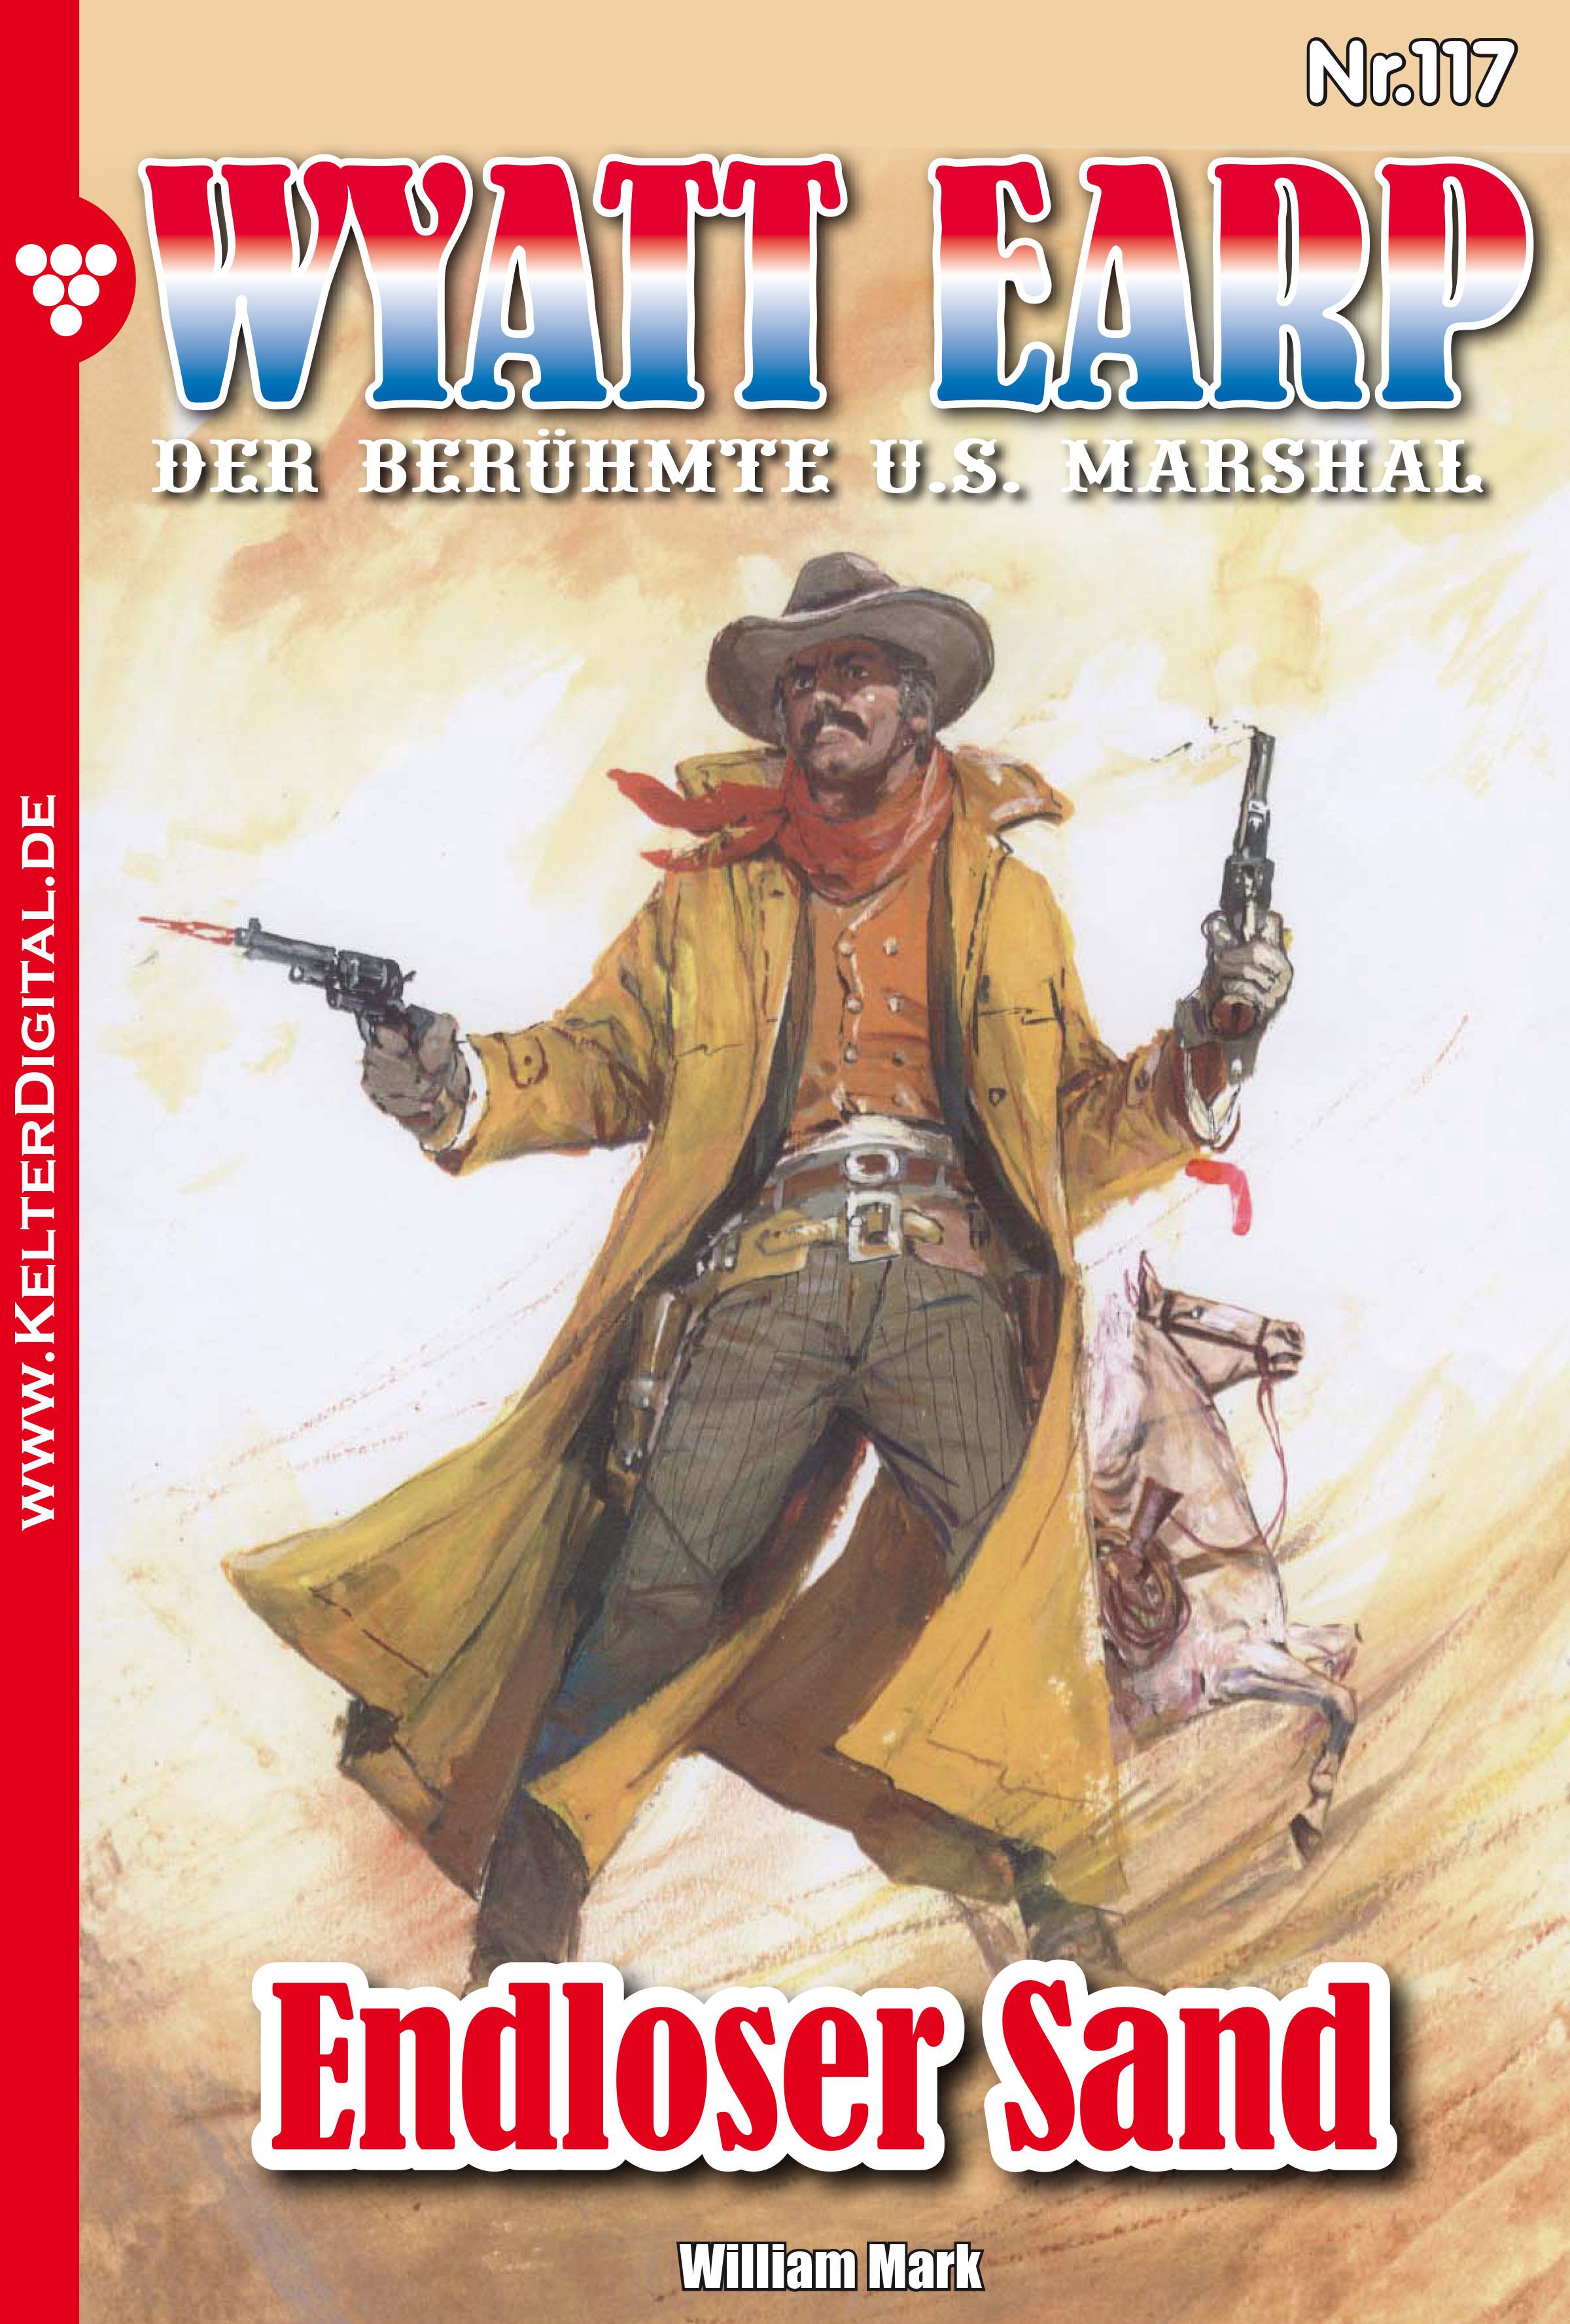 William Mark Wyatt Earp 117 – Western william mark wyatt earp classic 31 – western